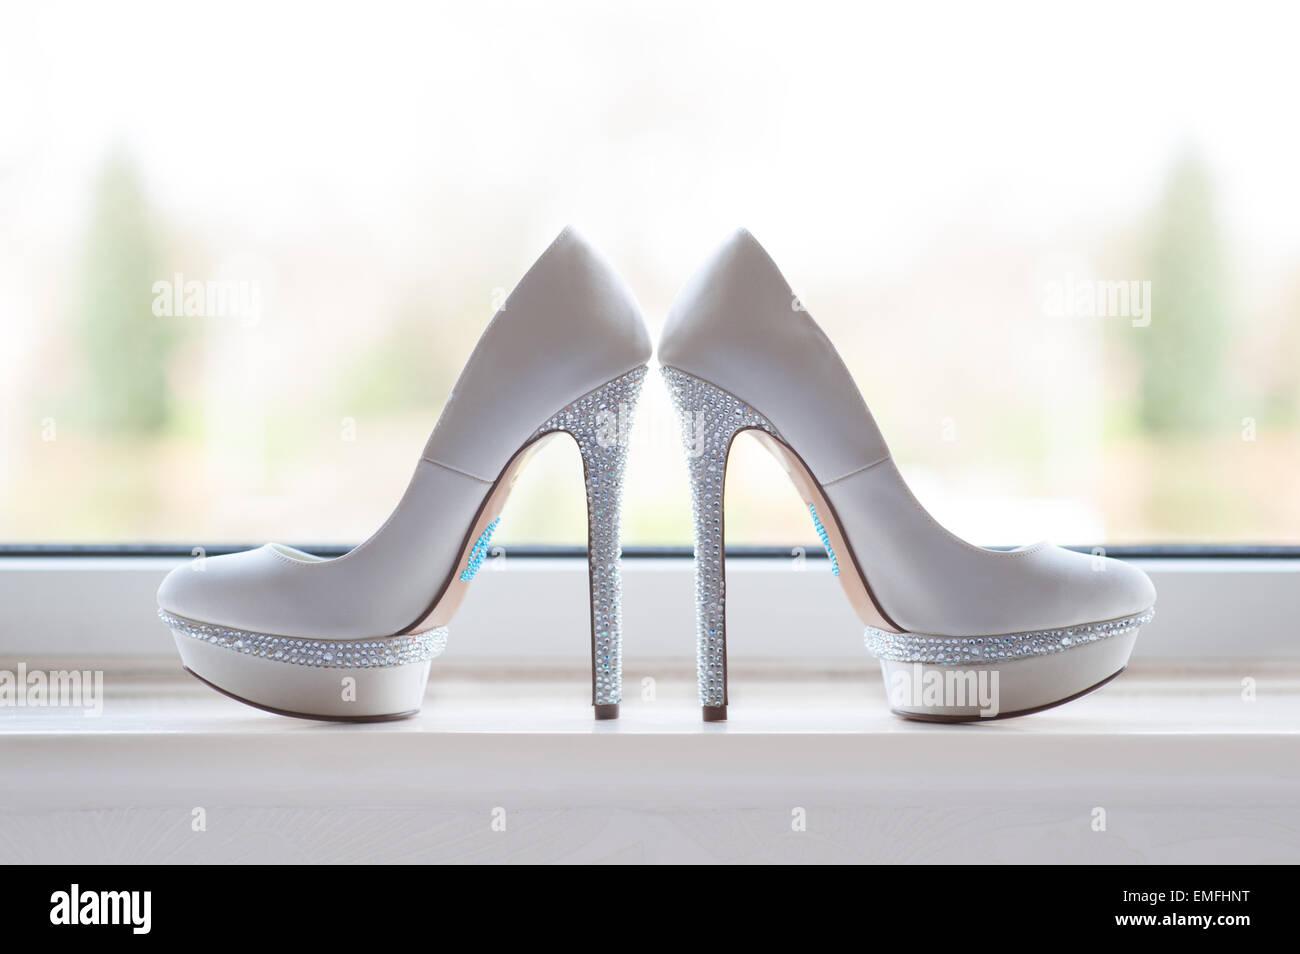 Brides chaussures de mariage Photo Stock